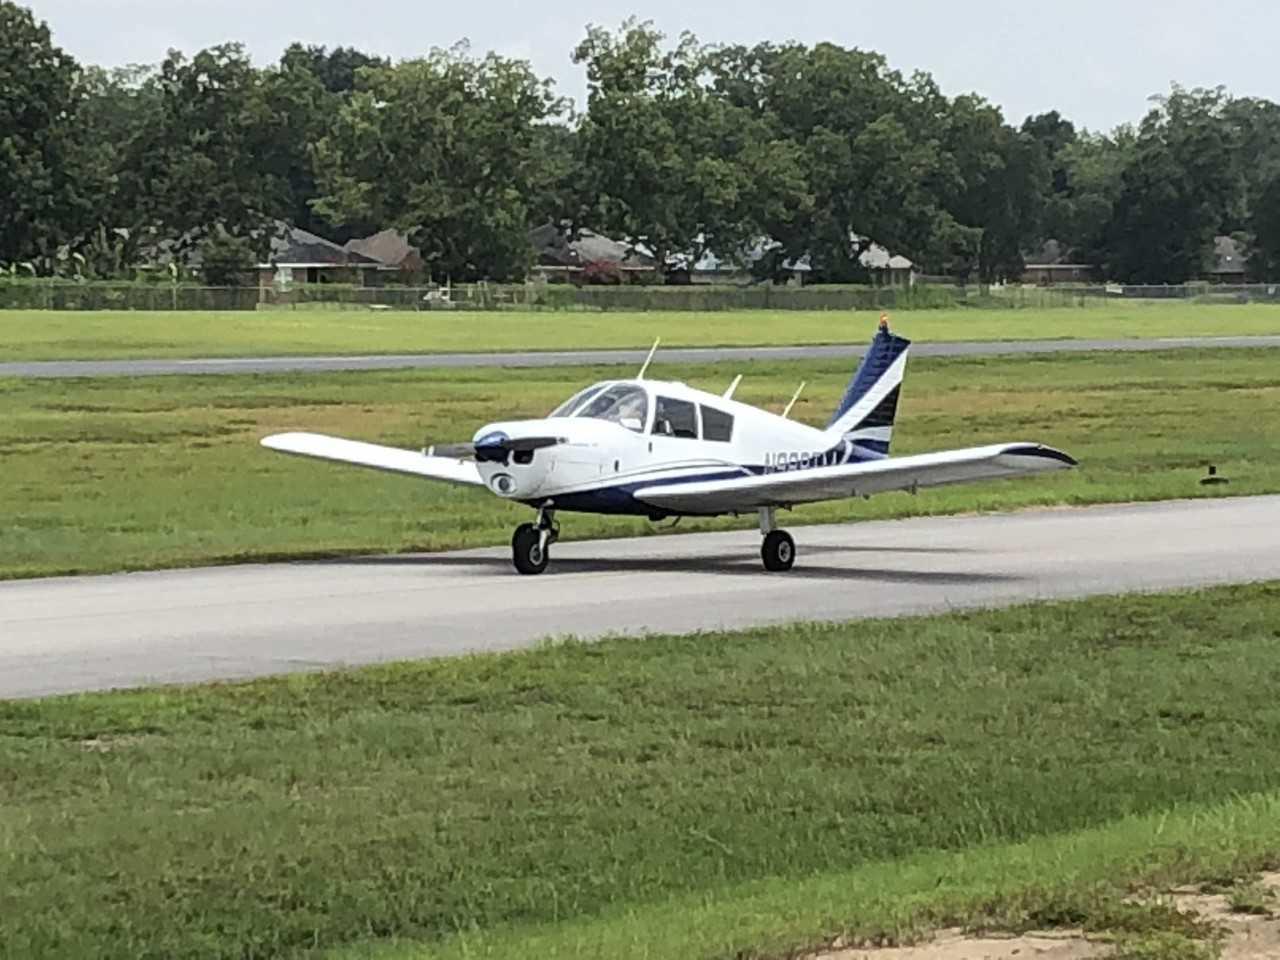 Foley airport plane_1532983012736.jpg-842137442.jpg